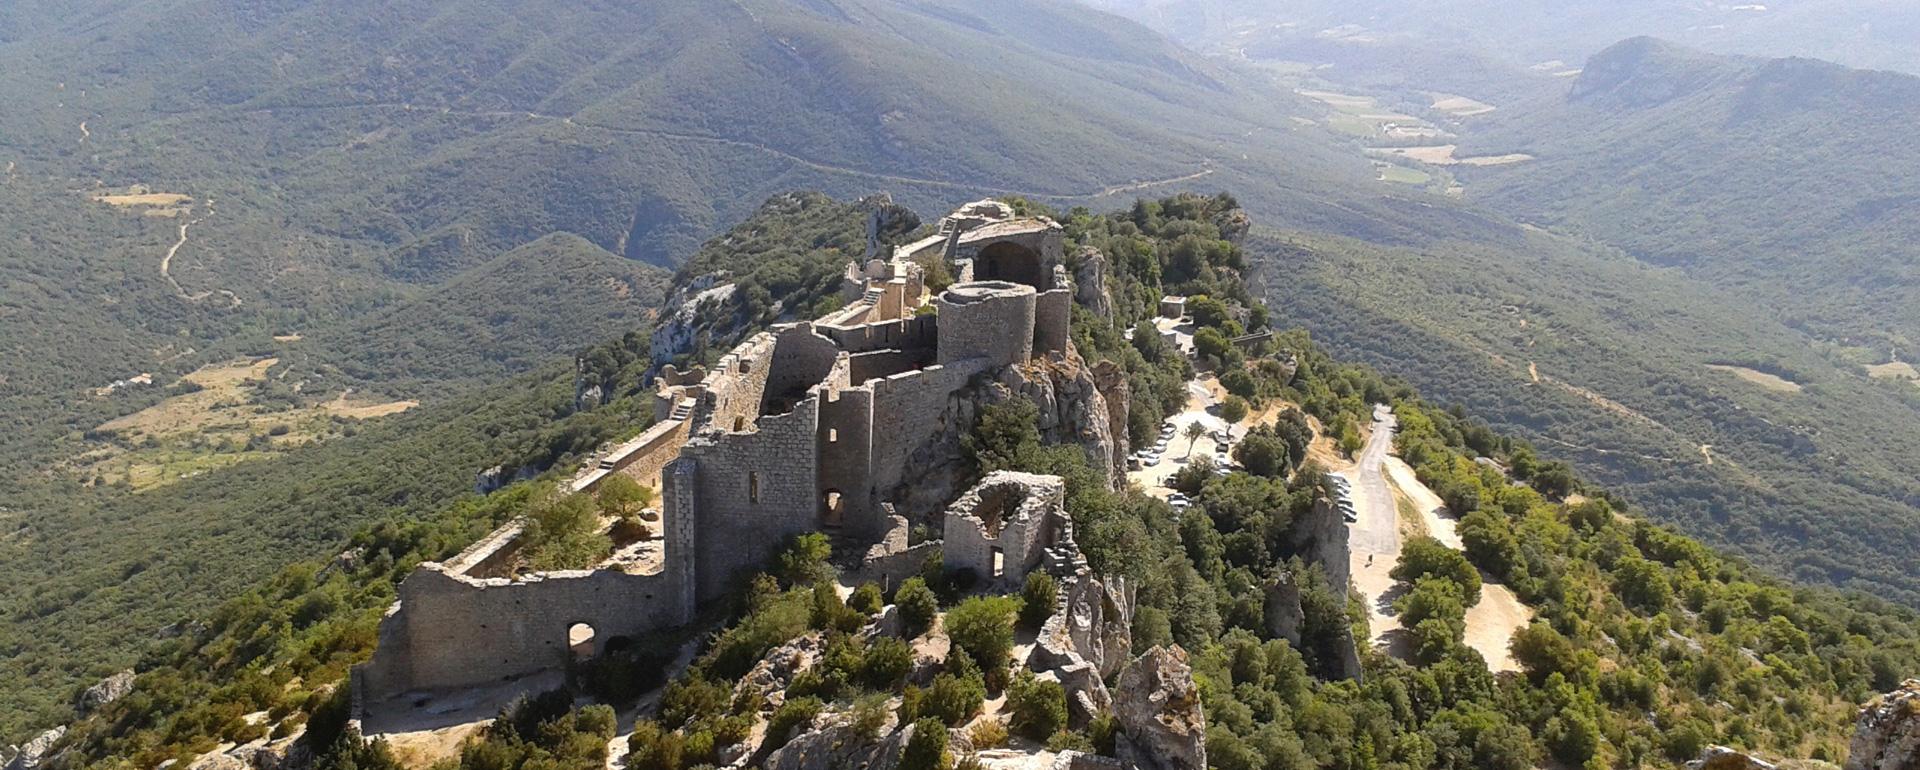 Château de Peyrepertuse - Aude